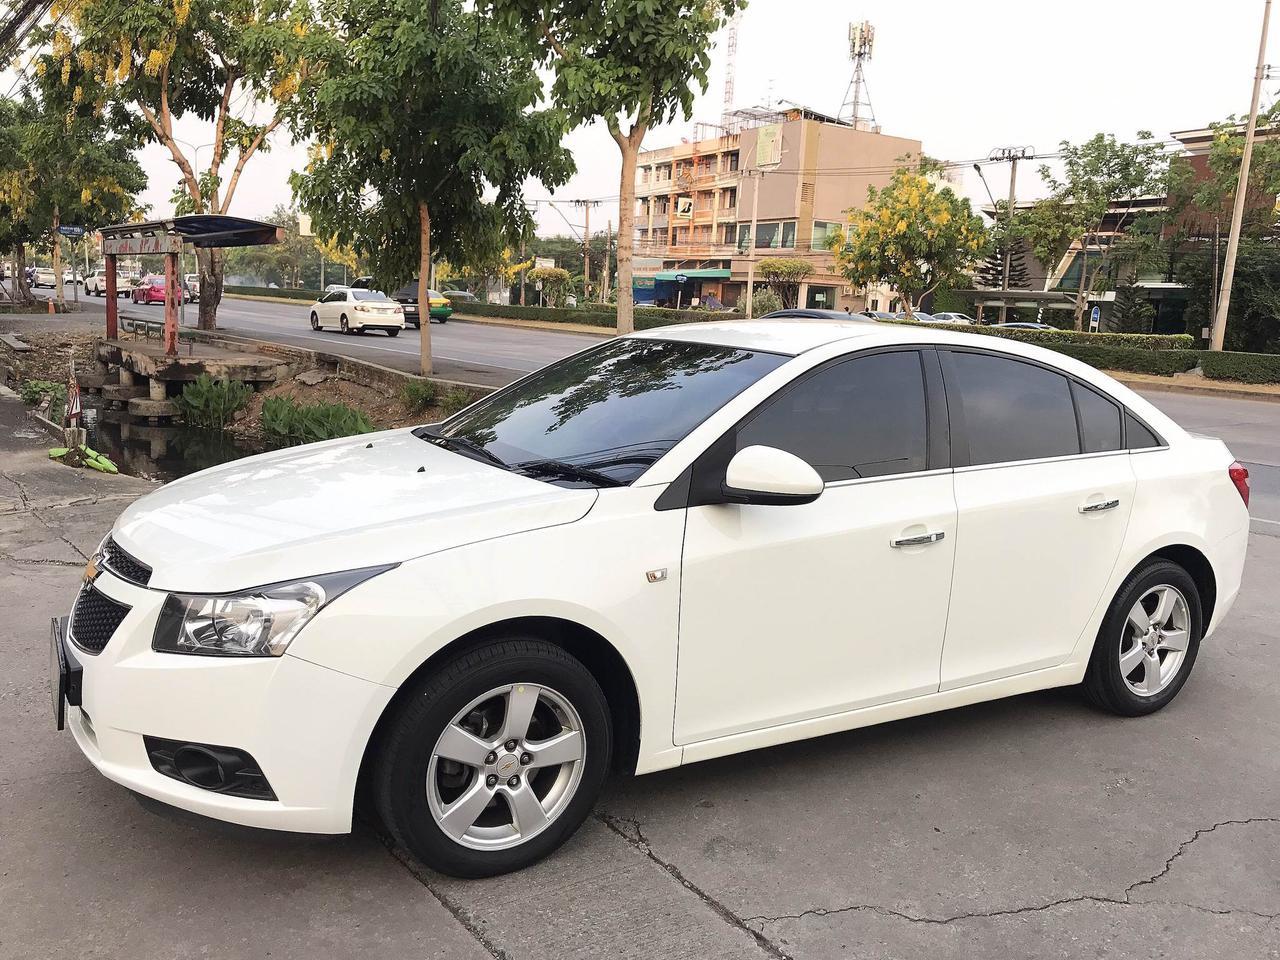 CHEVROLET CRUZE 1.8 LT auto ปี2011 สีขาว รถบ้านมือเดียวไม่มีชนสวยเดิม รูปที่ 1